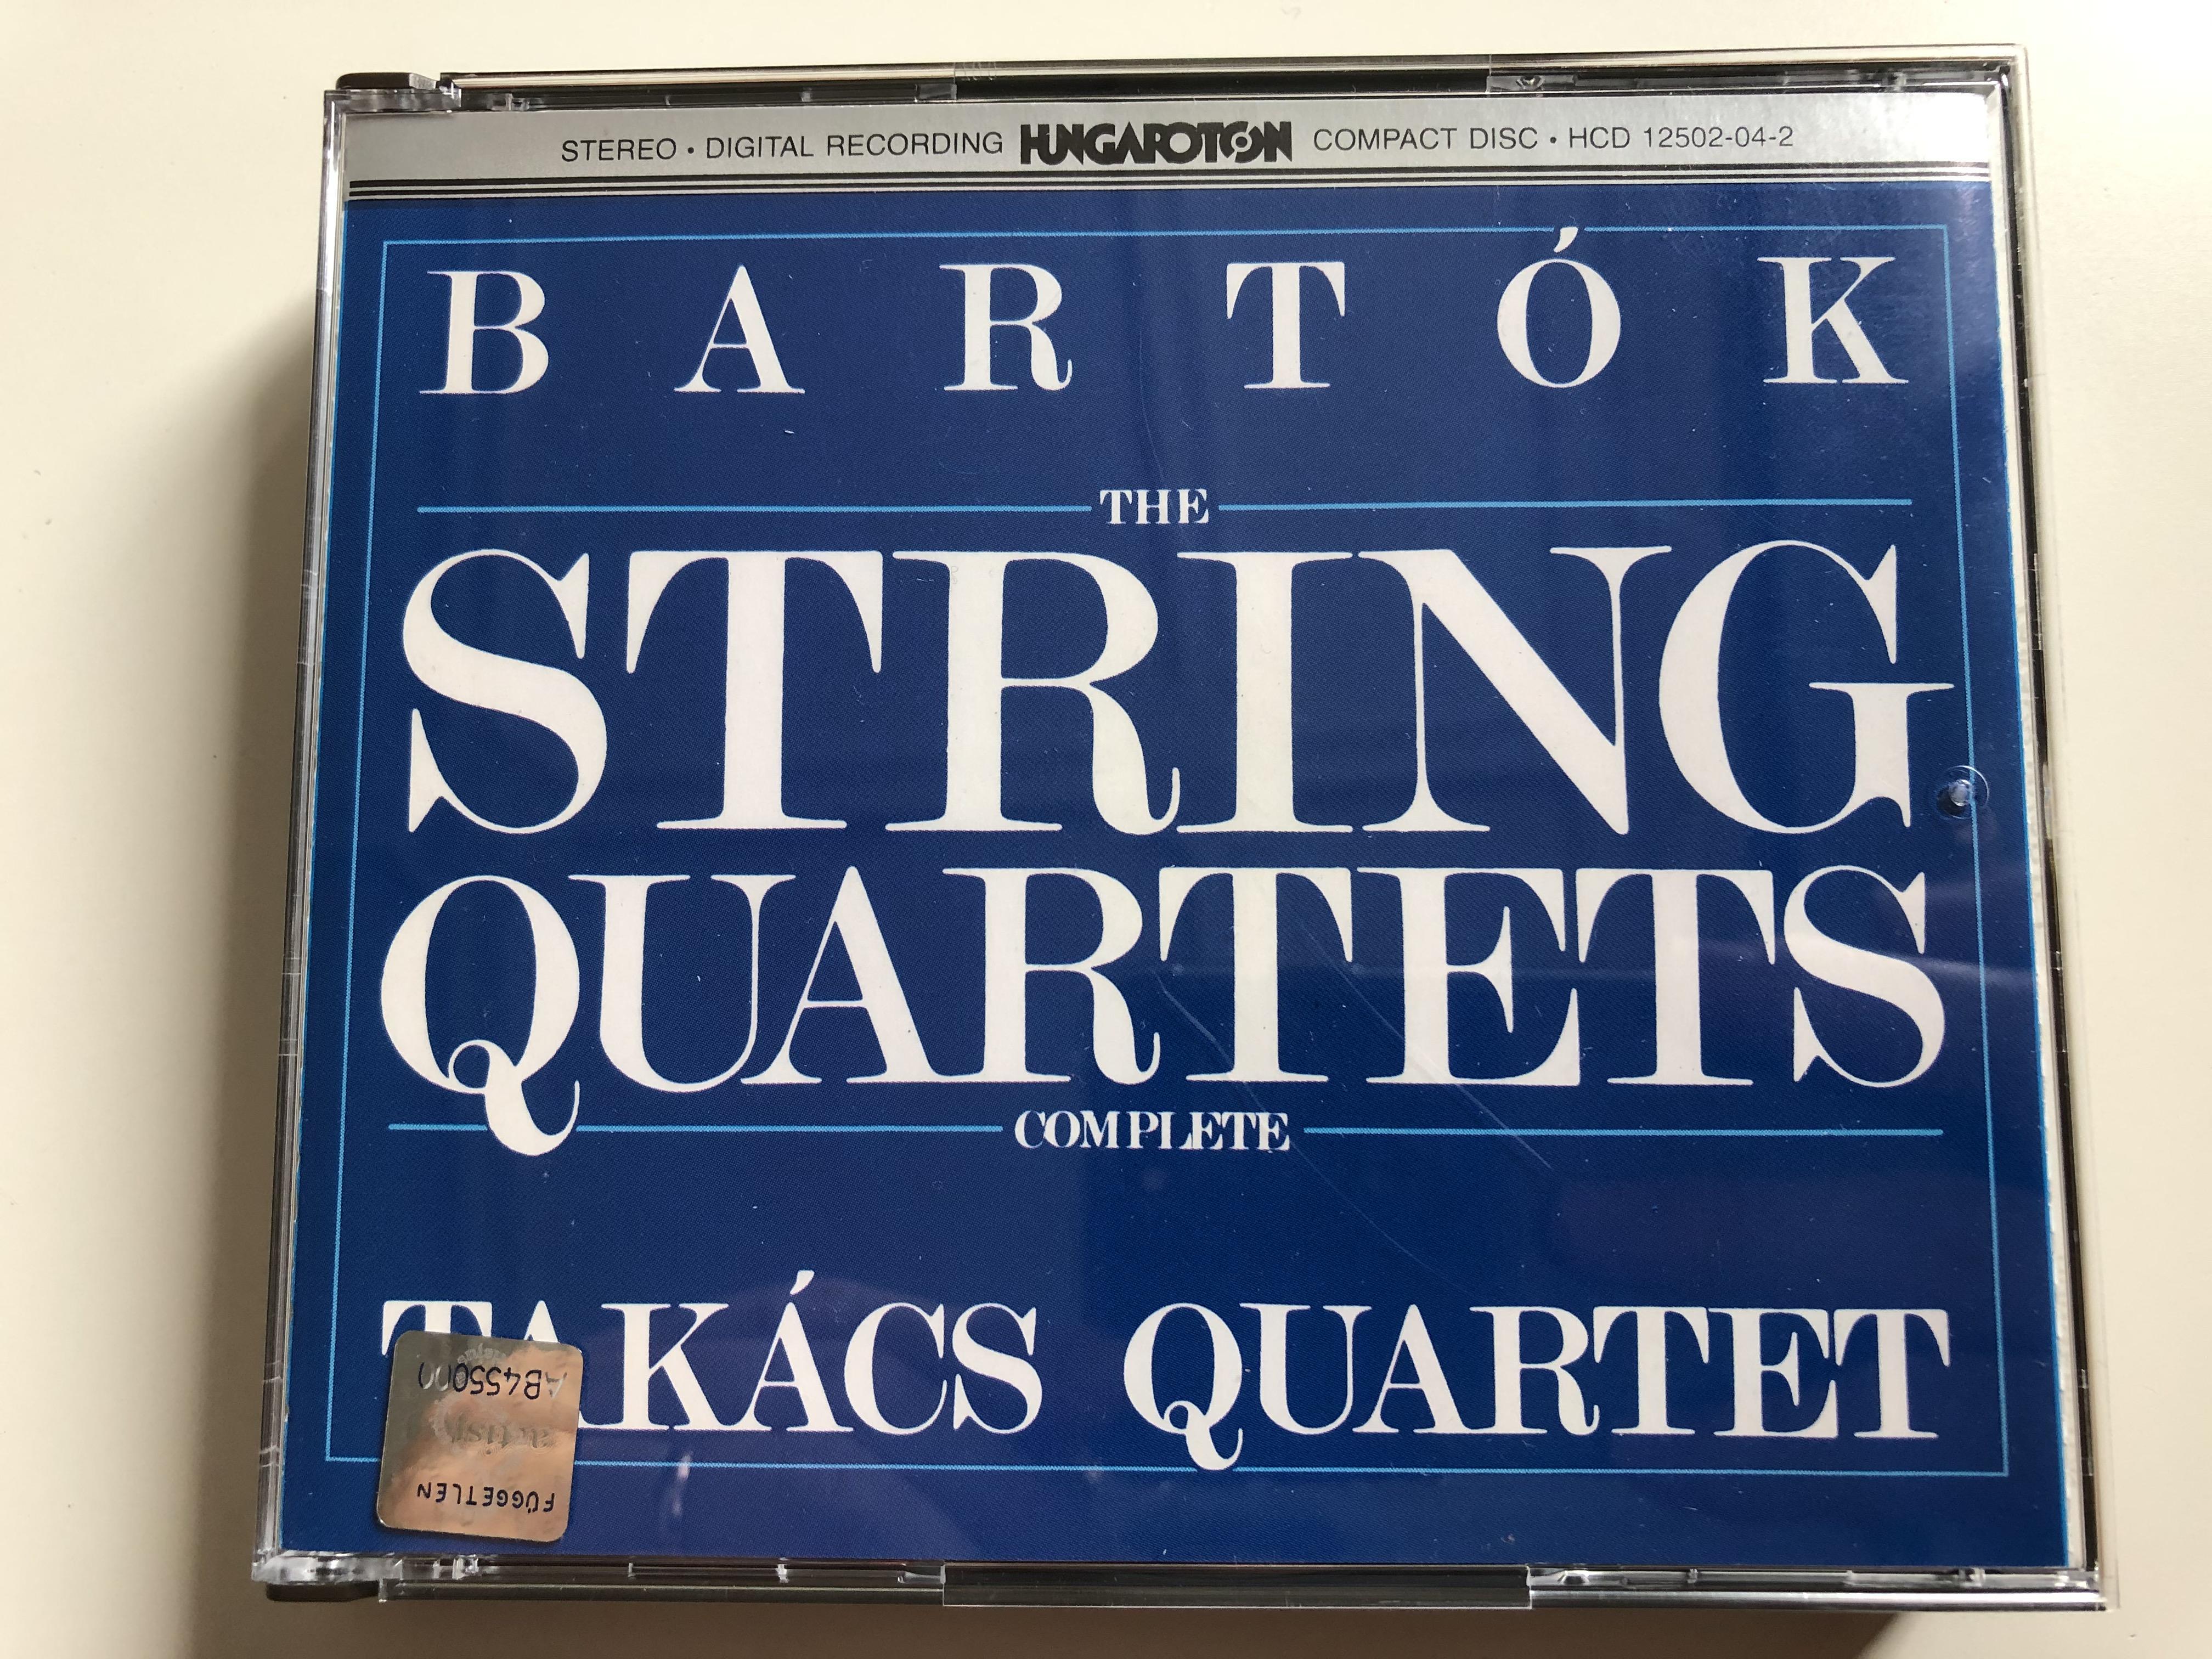 bart-k-the-string-quartets-complete-tak-cs-quartet-hungaroton-3x-audio-cd-1995-stereo-hcd-12502-04-2-1-.jpg